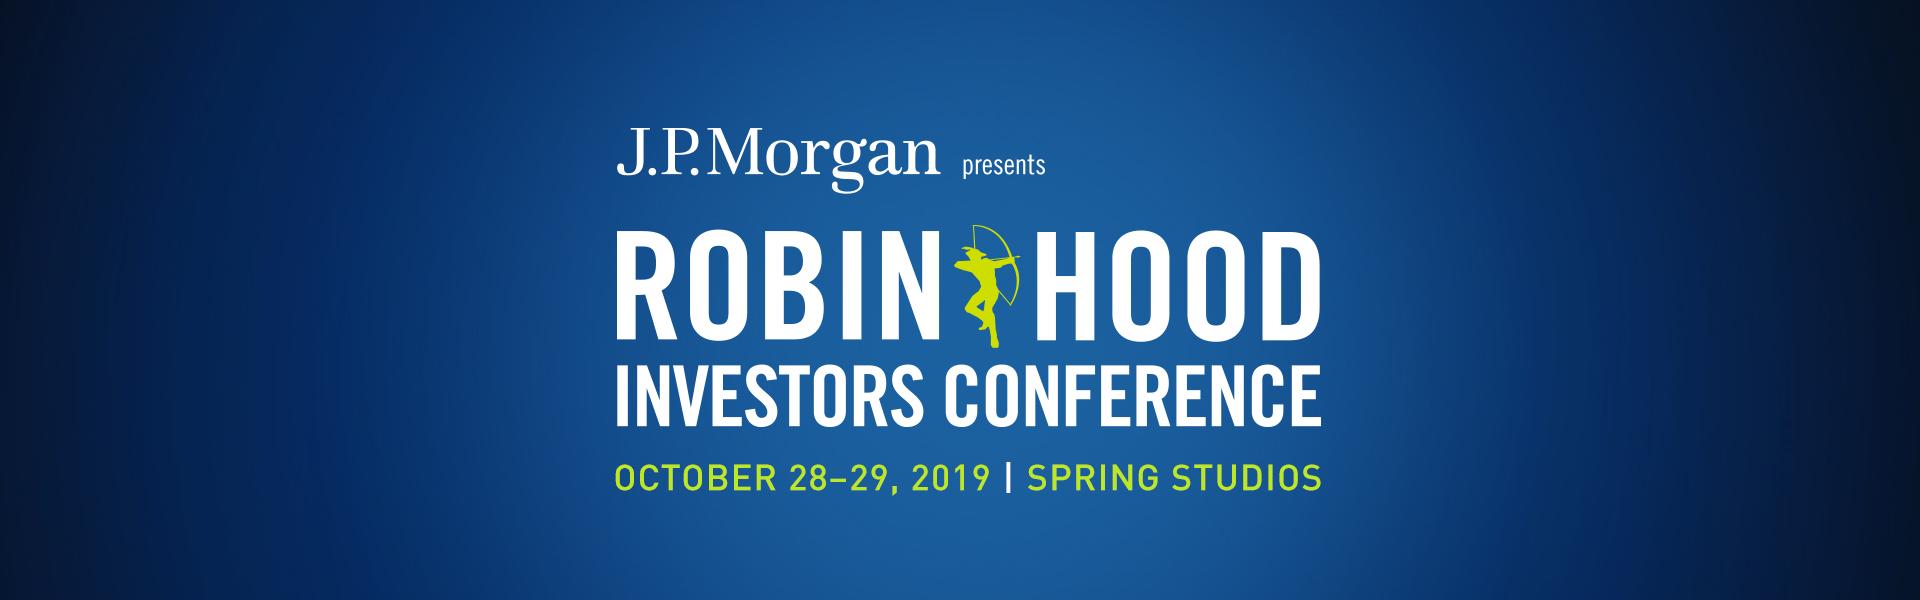 Robin Hood Investors Conference 2019